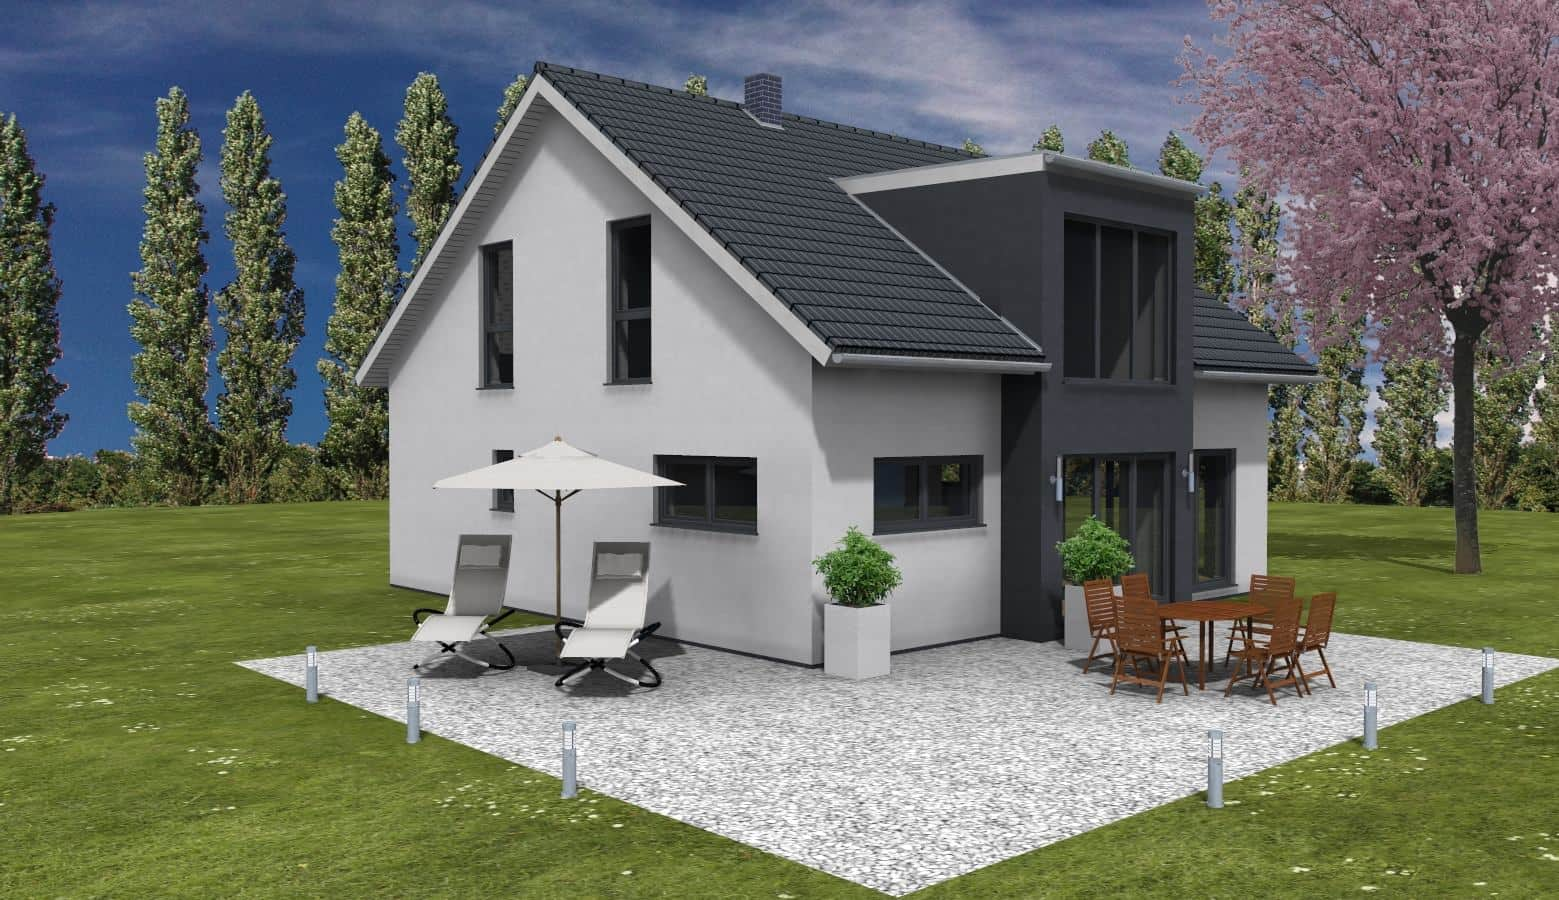 ^ FischerHaus Hausbesichtigung – am 12.06.2016 Musterhaus.net